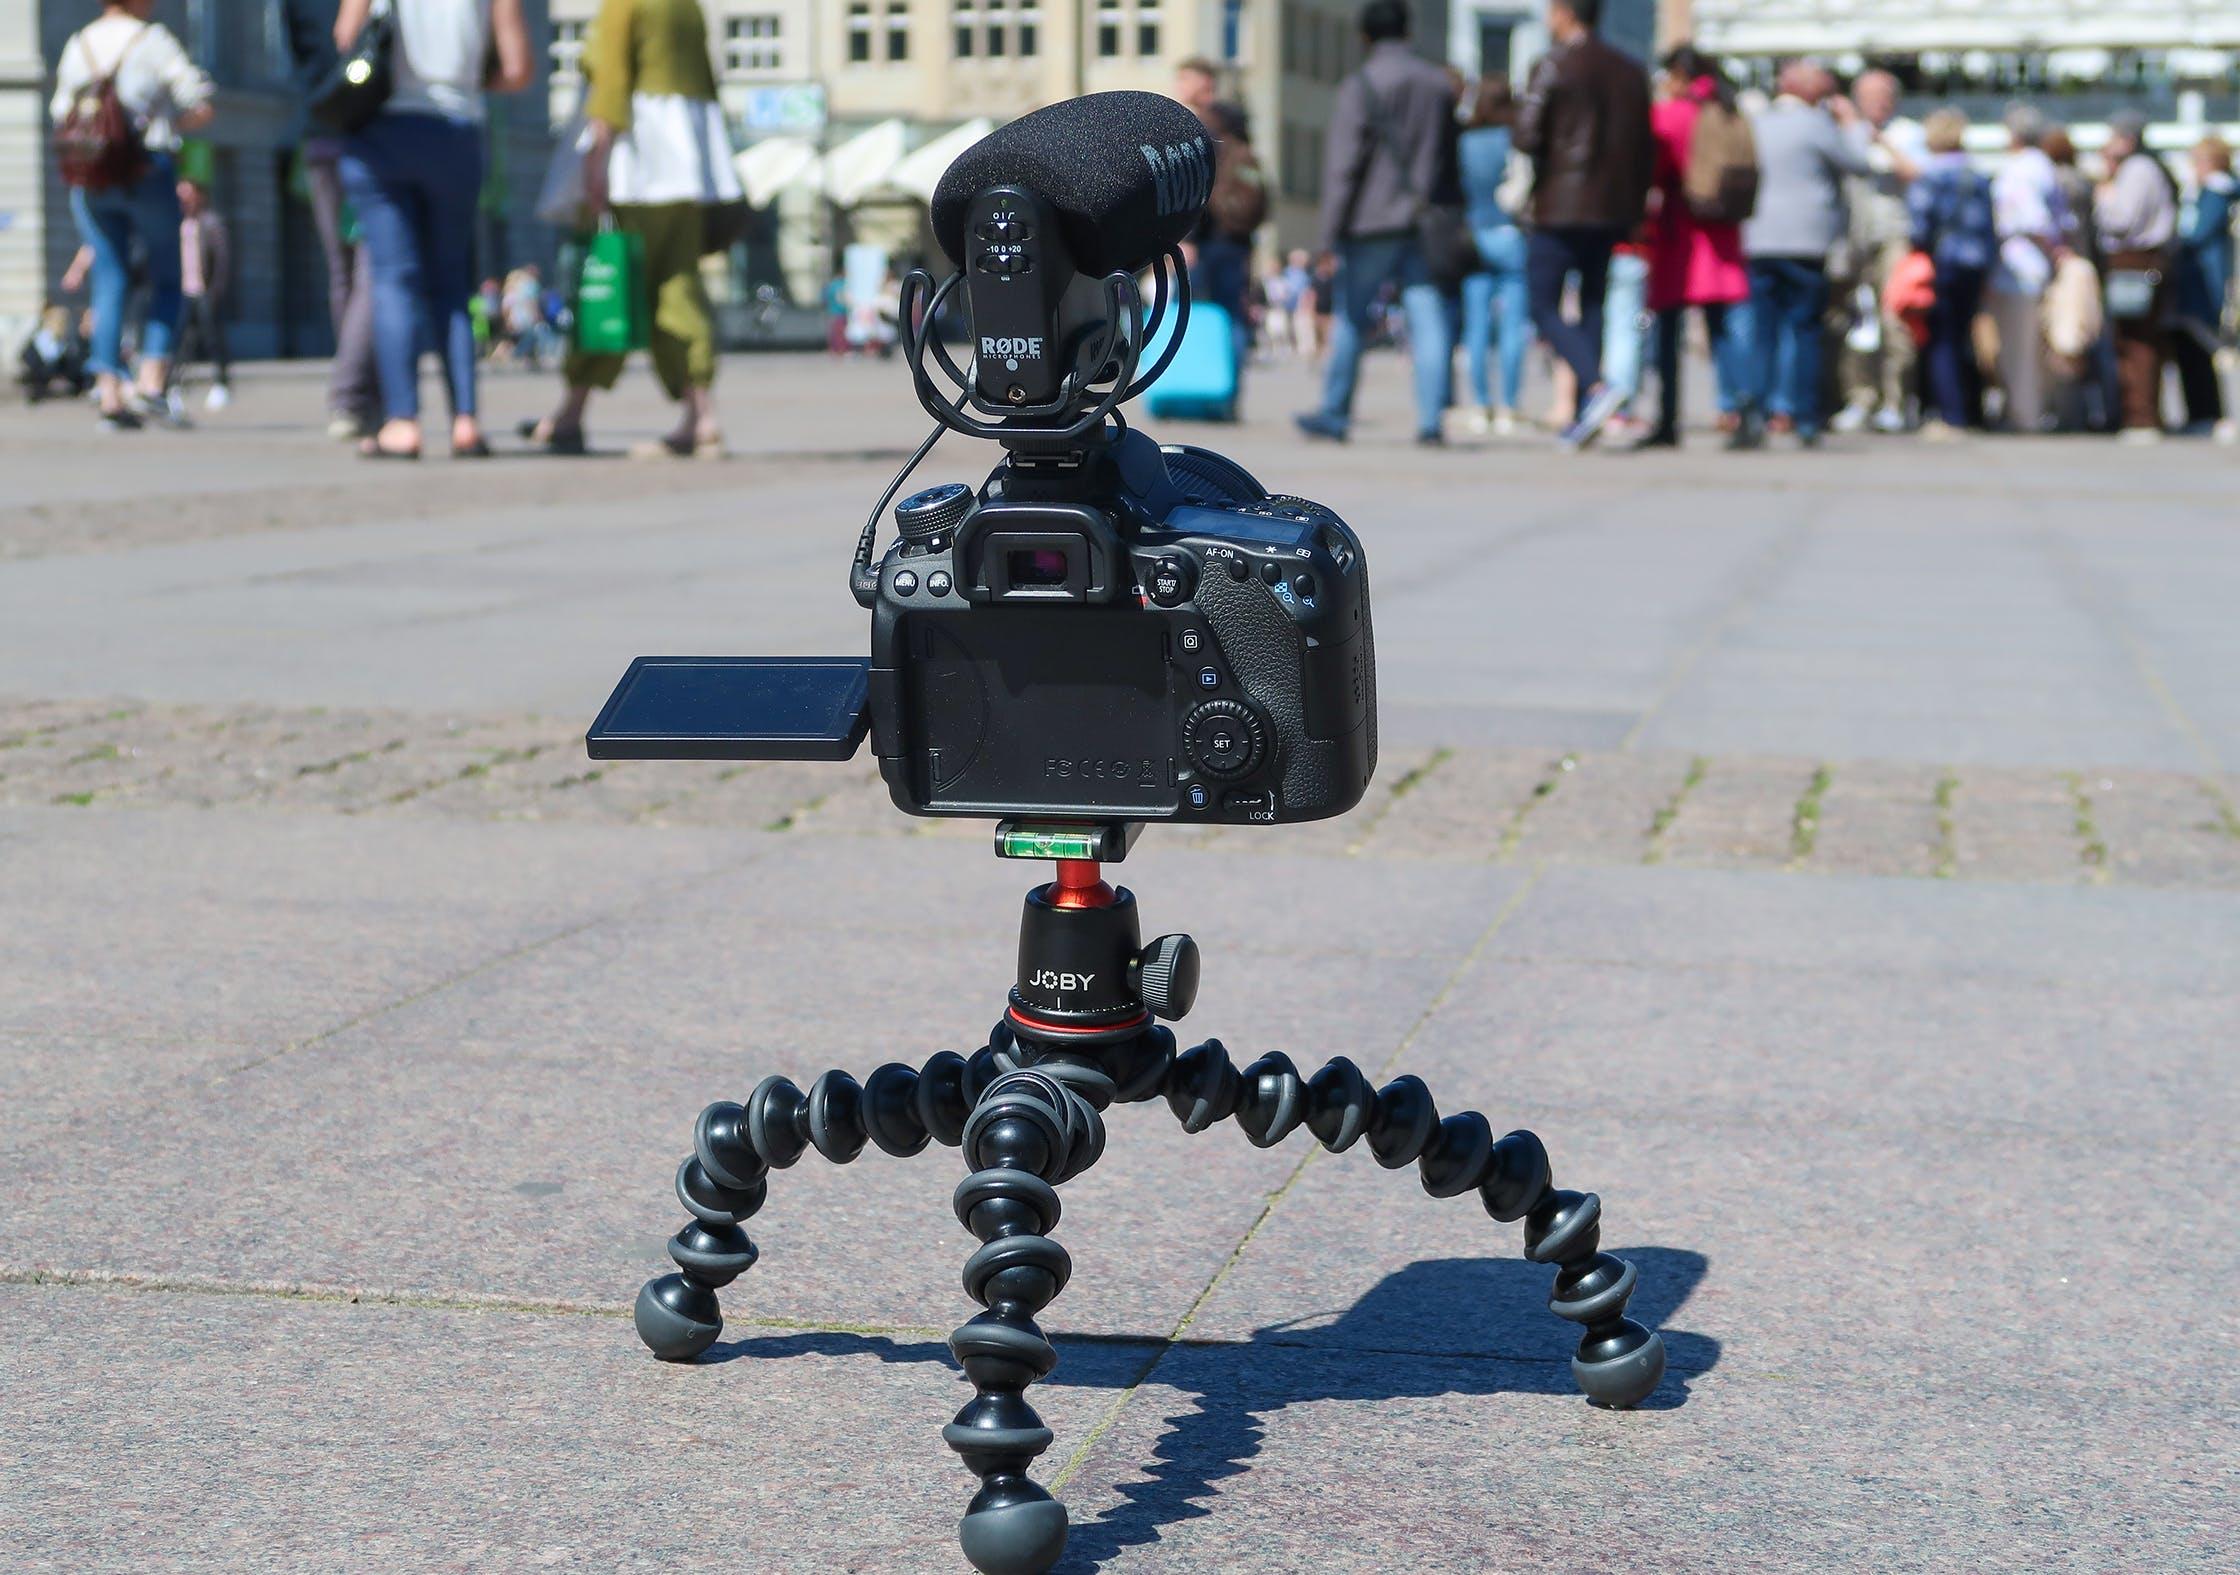 Using The JOBY GorillaPod 3K As A Tripod In Hamburg, Germany